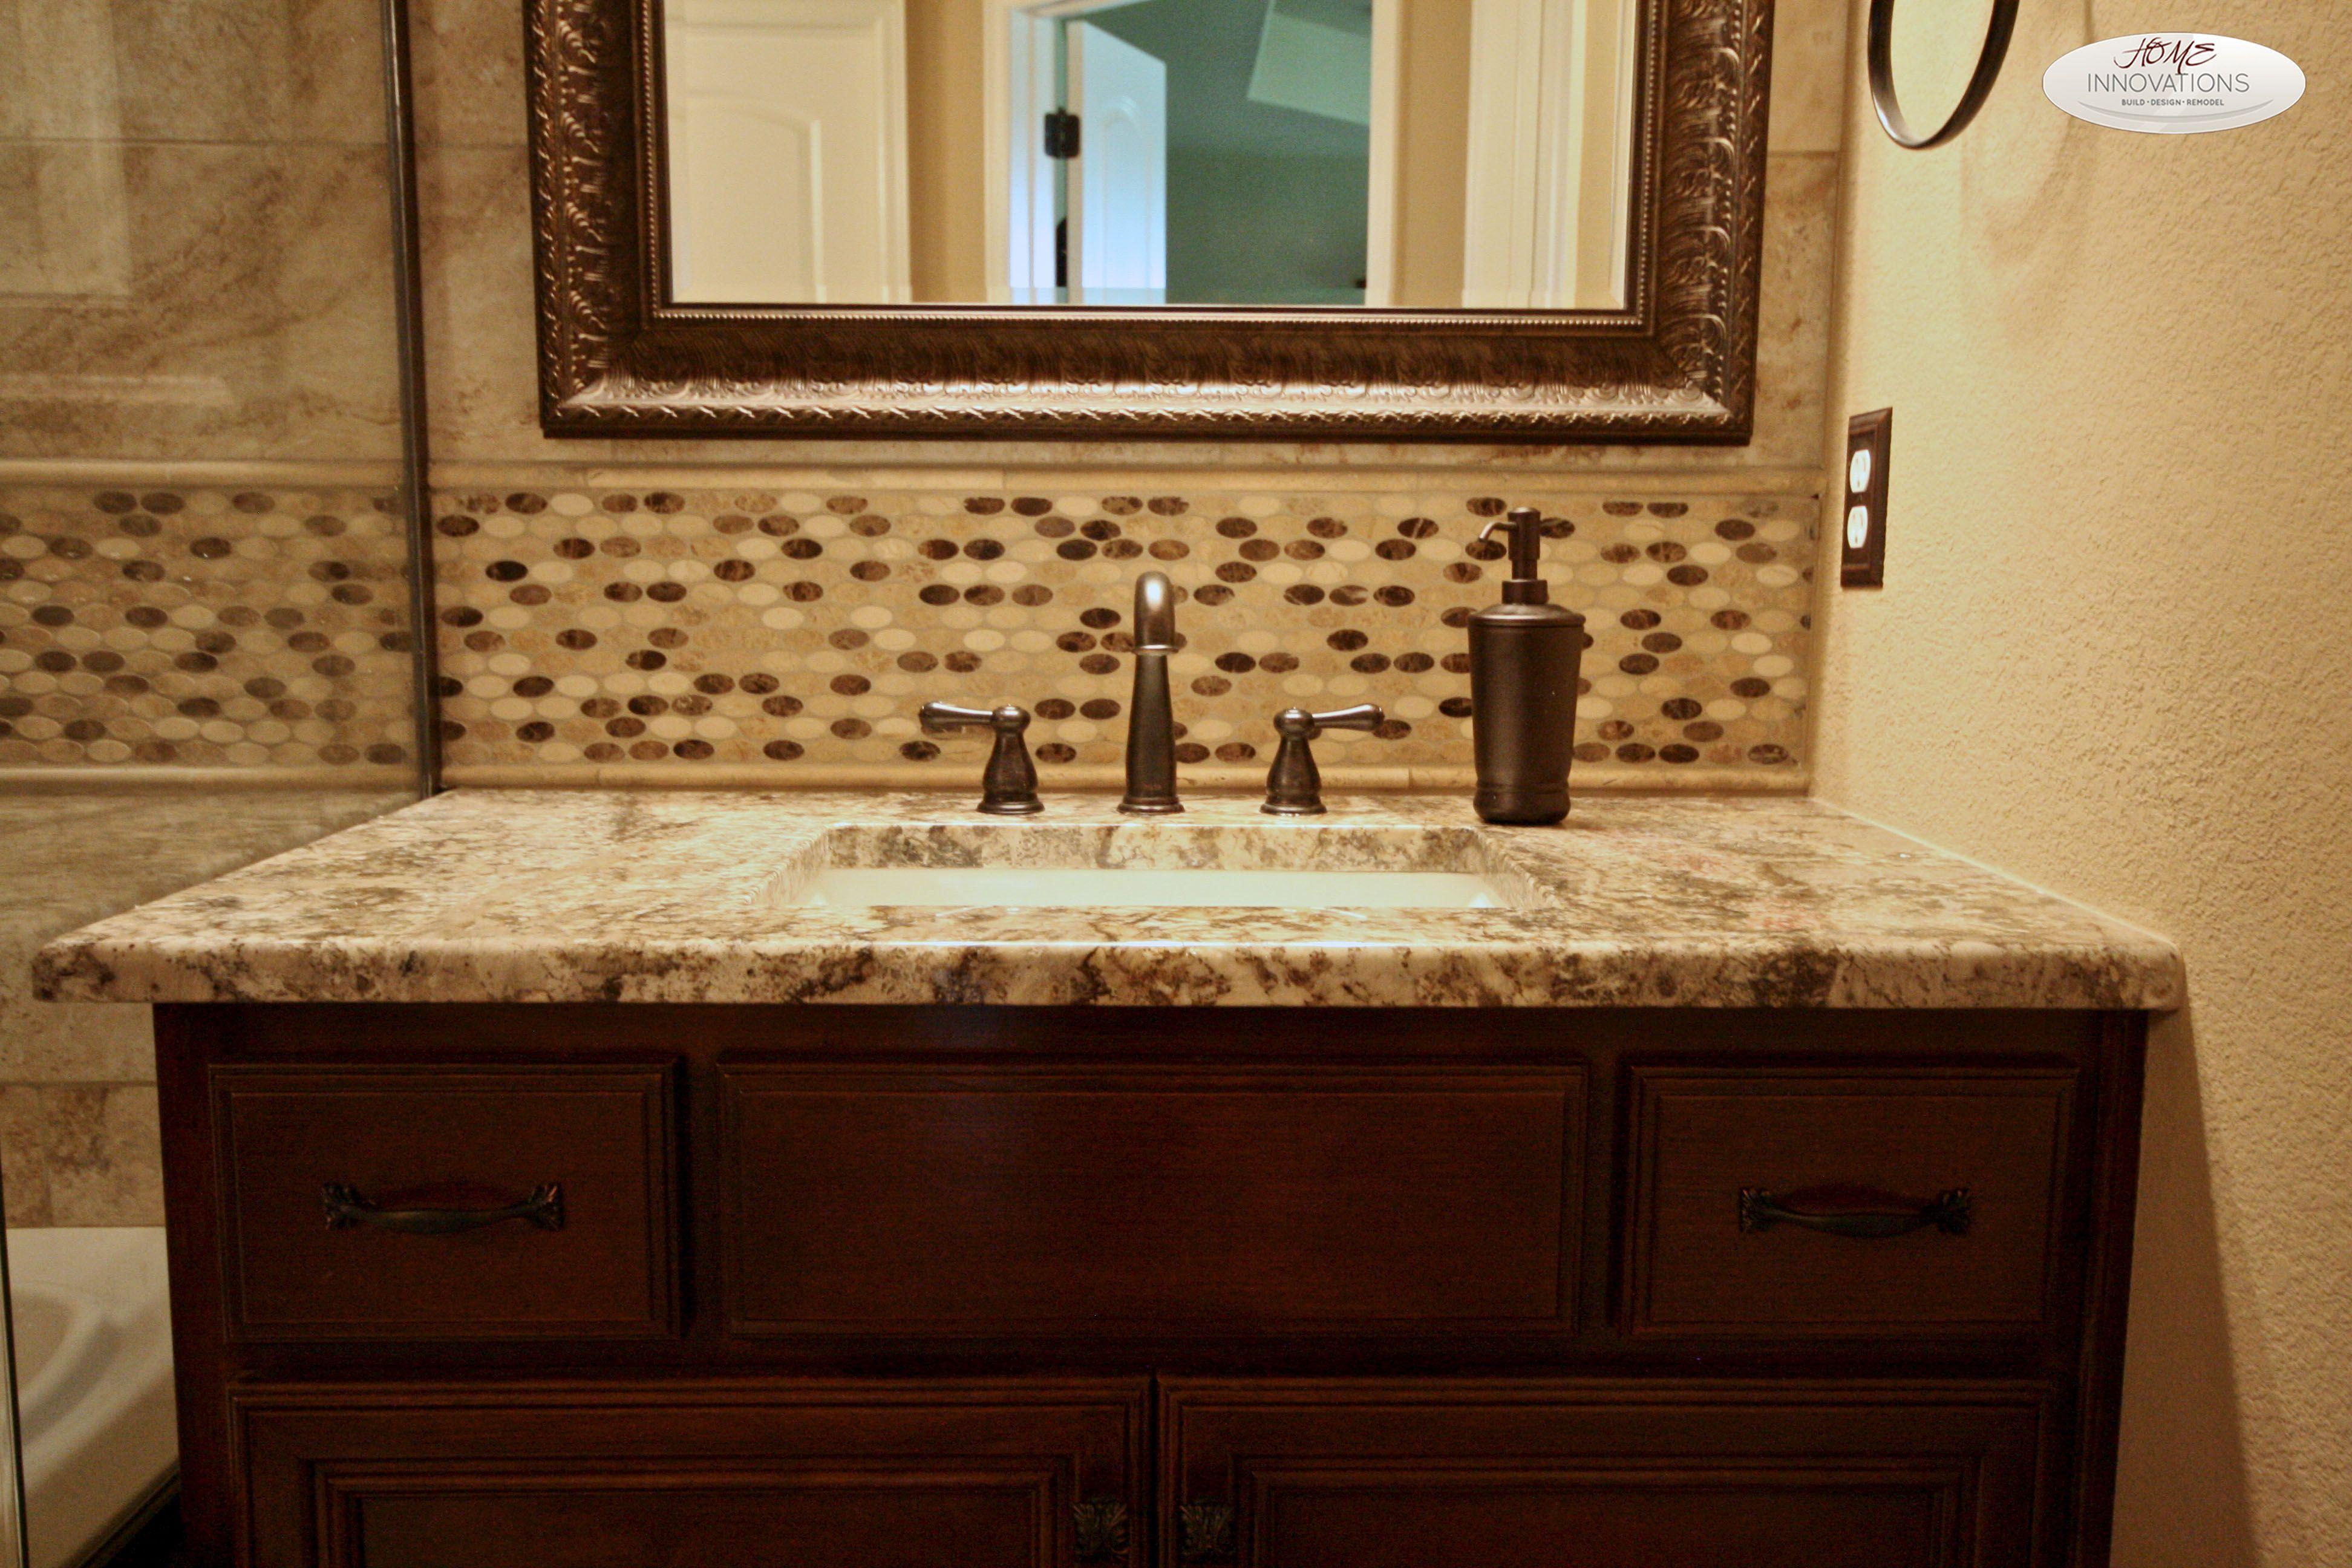 Bathroom Backsplash Dream Home Pinterest